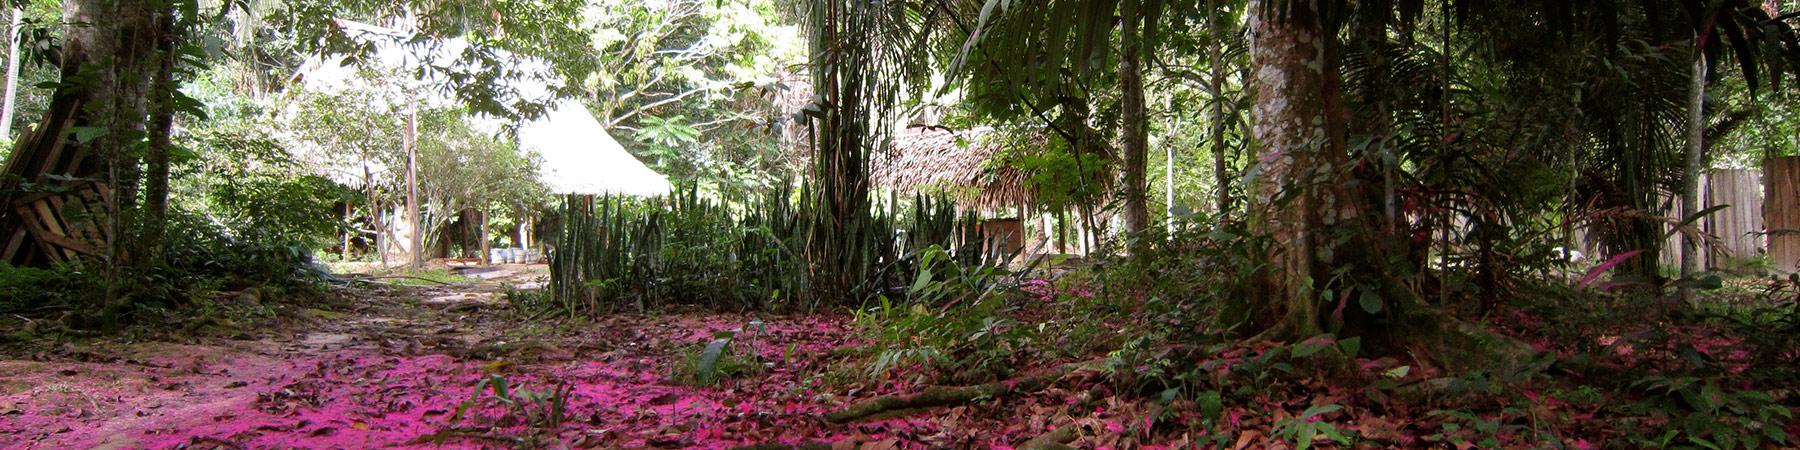 ABOUT US - Ayahuasca Retreat in Peru at the Nimea Kaya